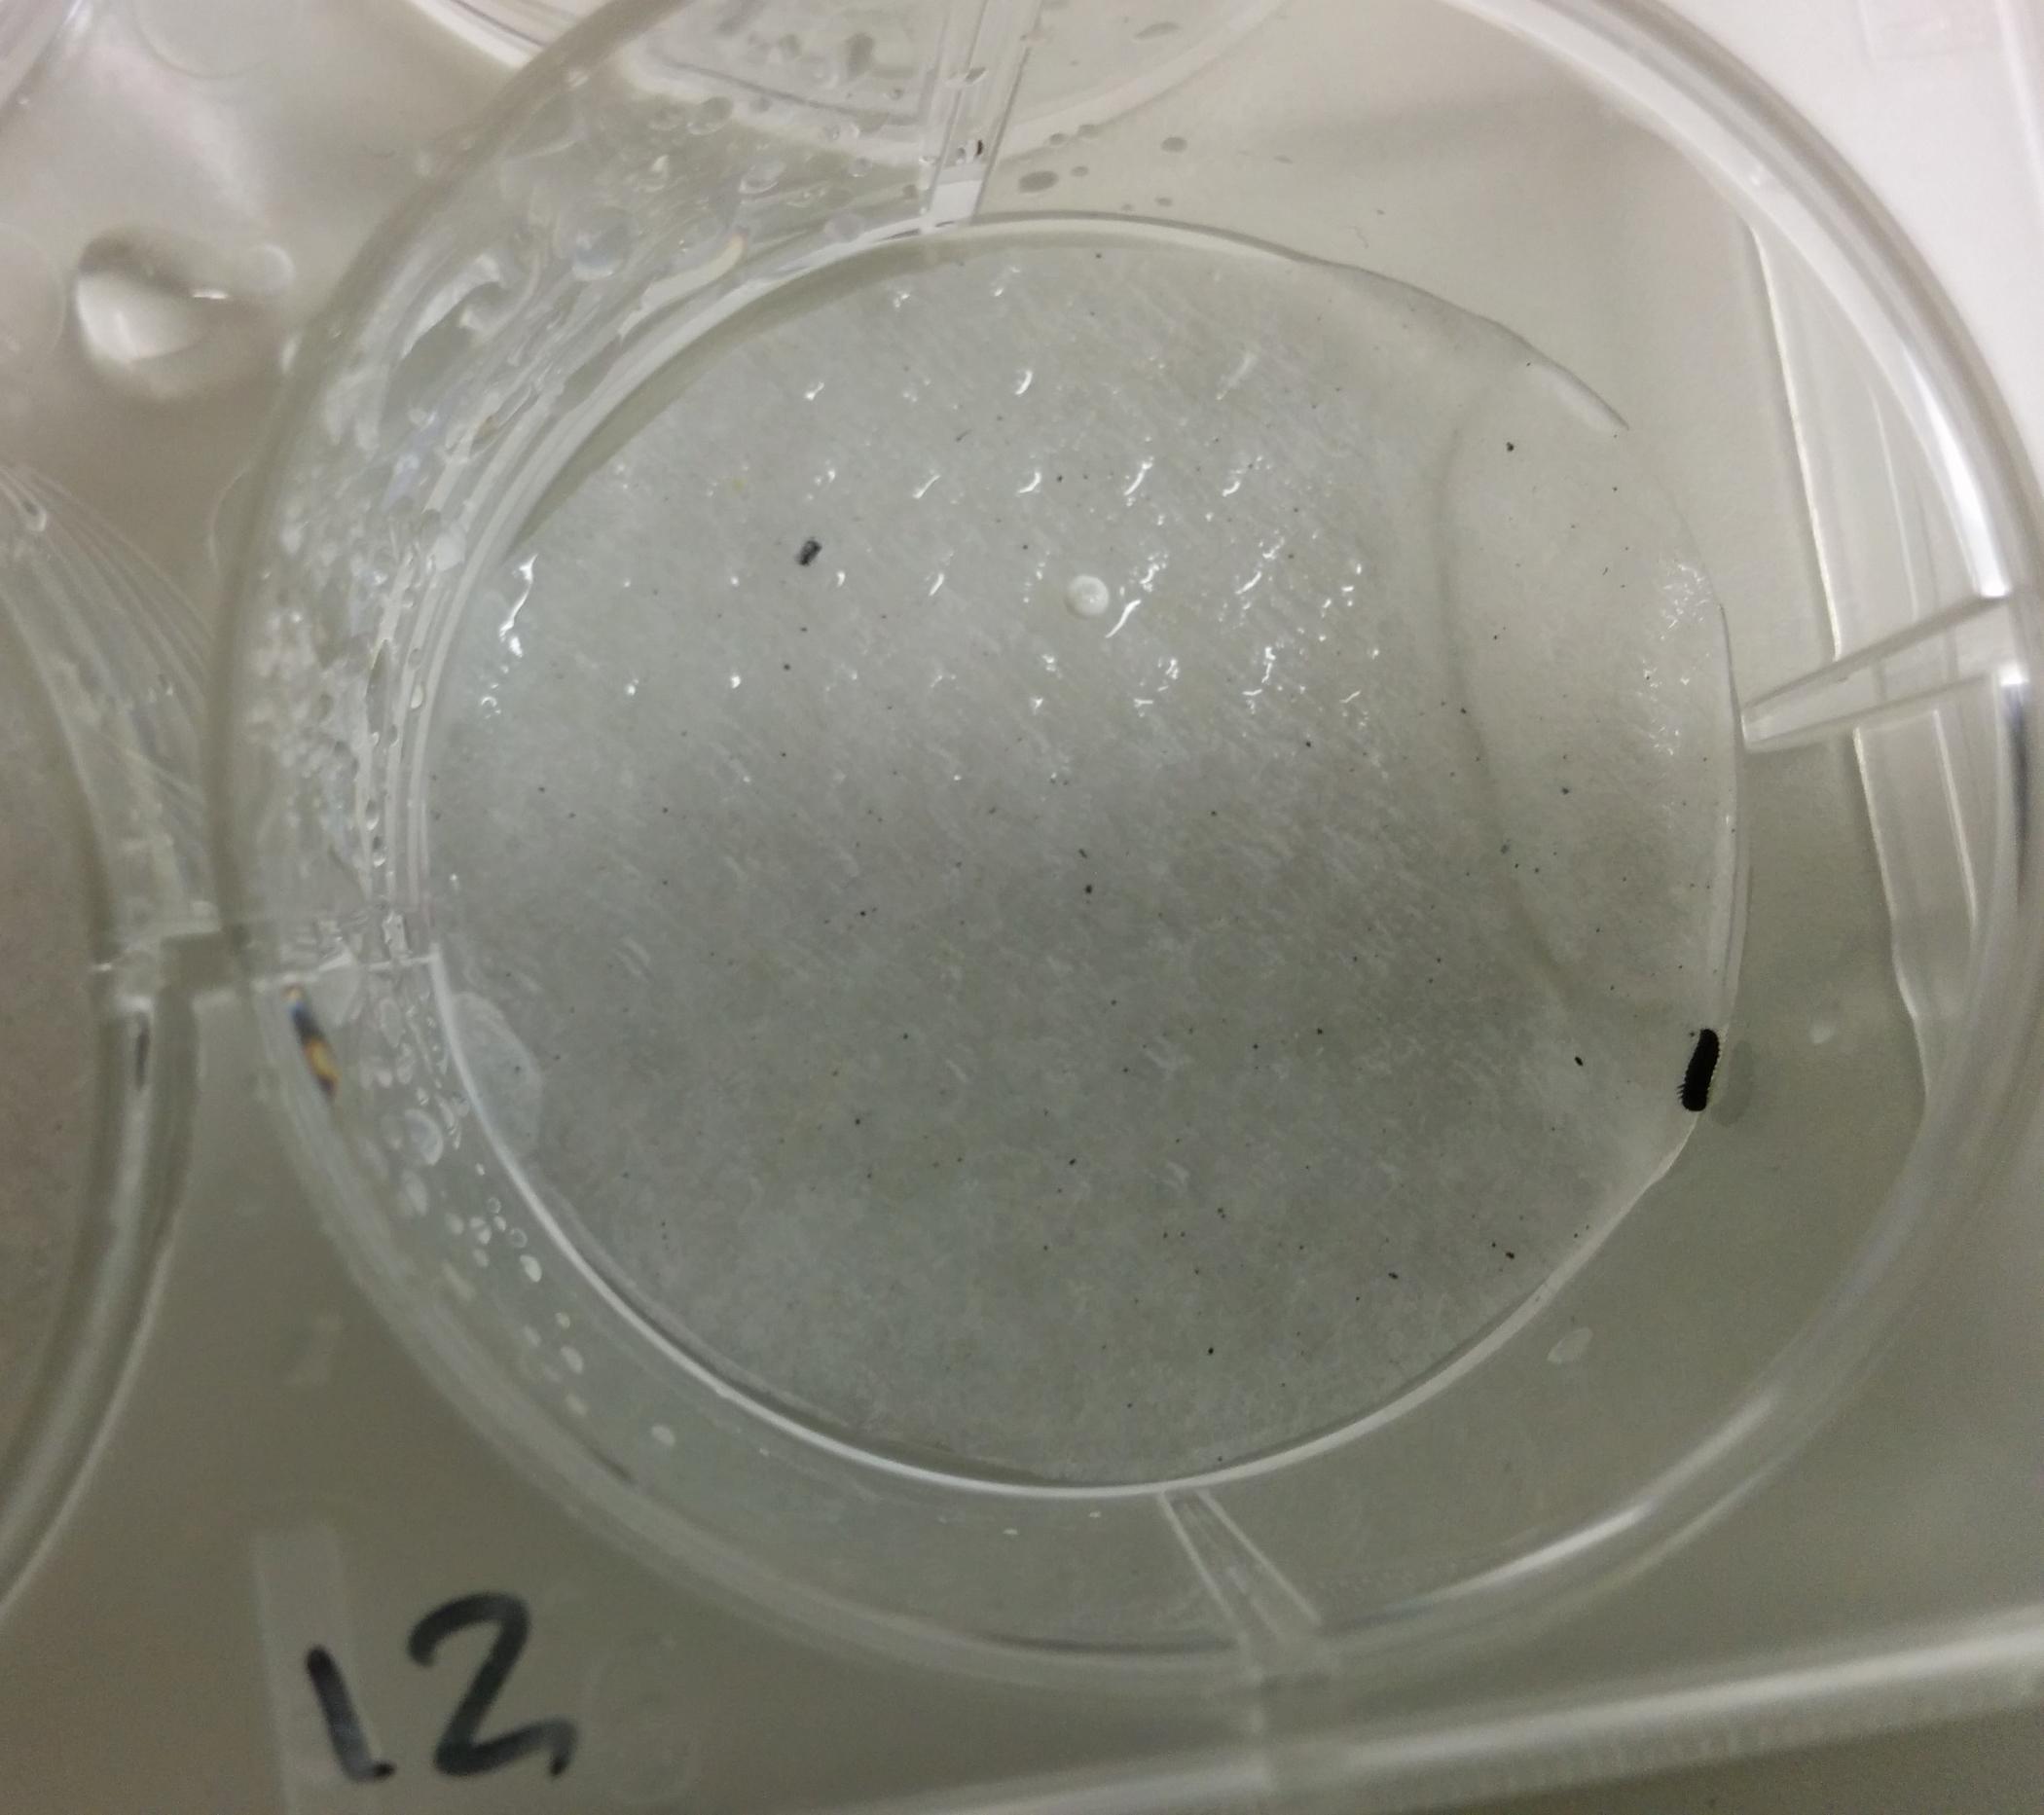 Newly hatched larva